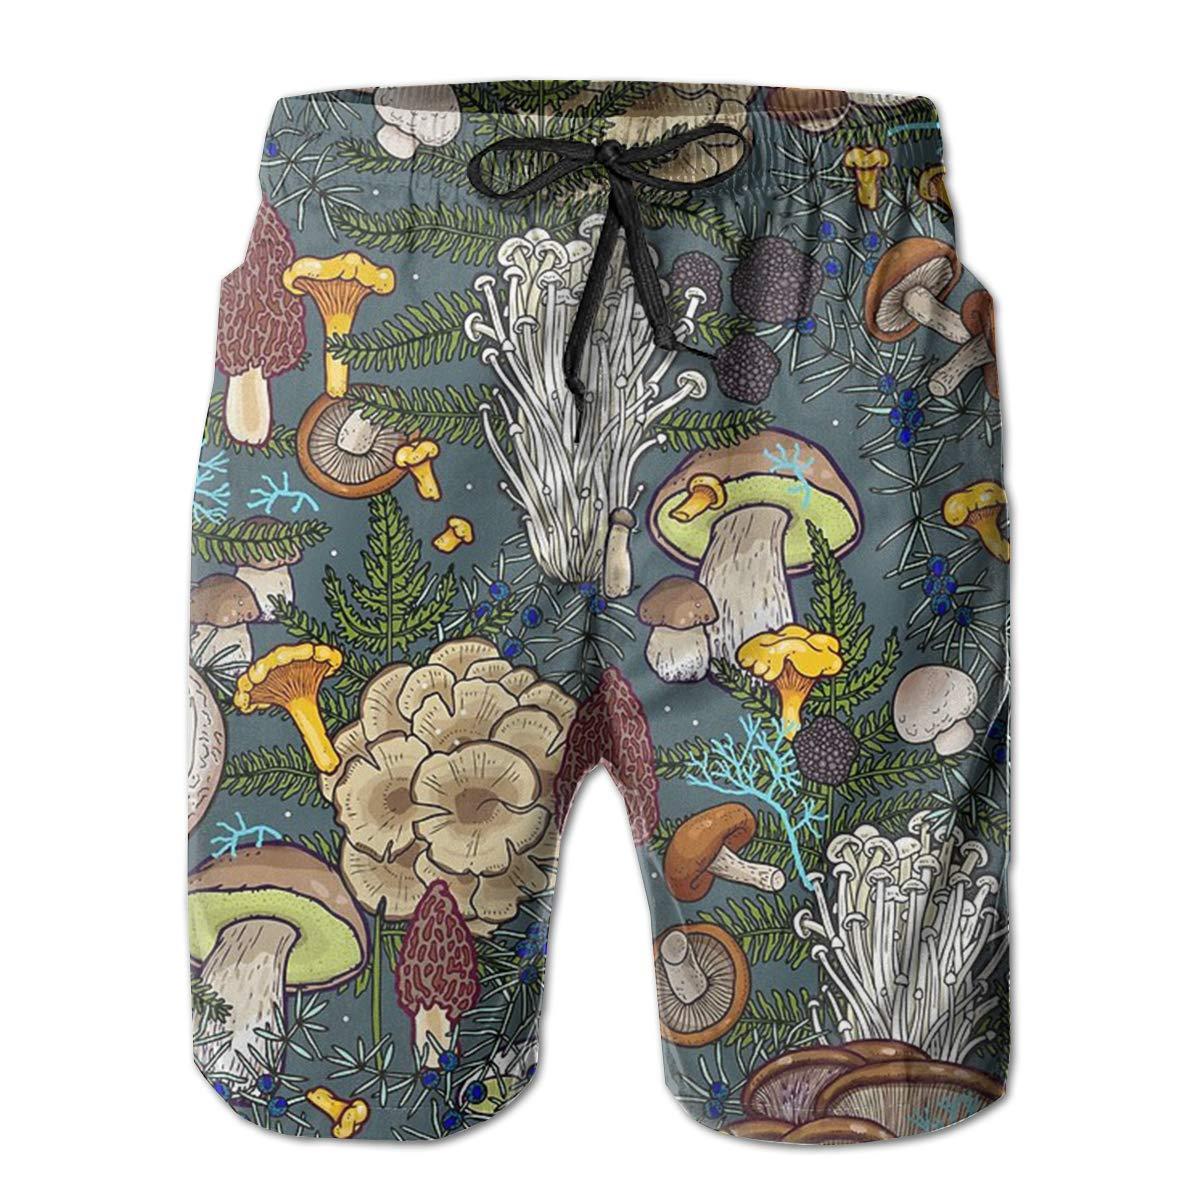 AA WIU Mushroom World Mens Funky Quick Dry Swim Trunk Drawstring Beach Board Shorts Swimsuit